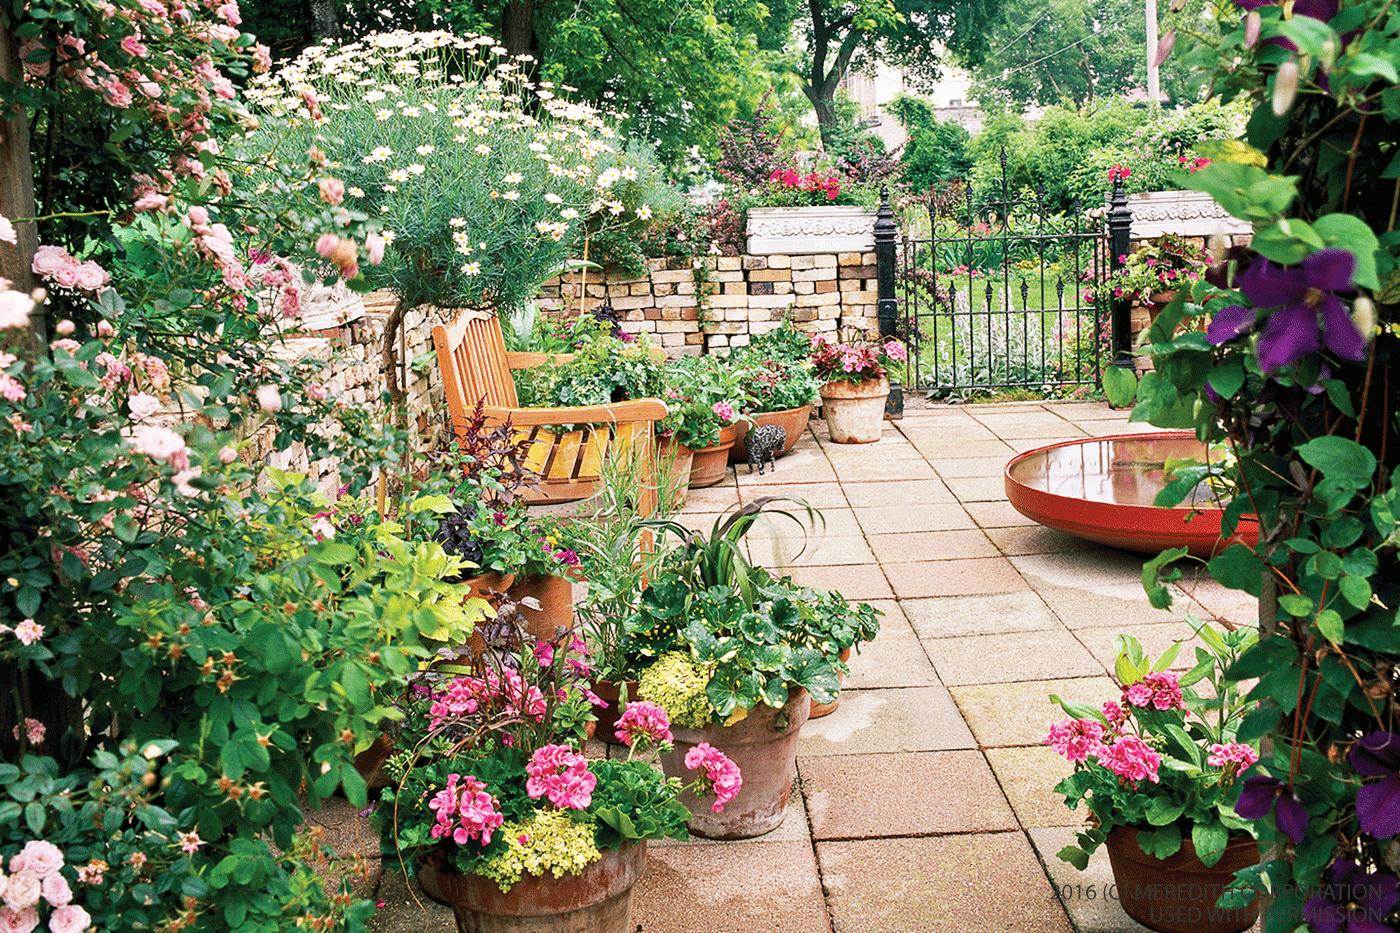 5199e5e21c05eccff2d5524bd411b3be - Better Homes And Gardens Design Ideas